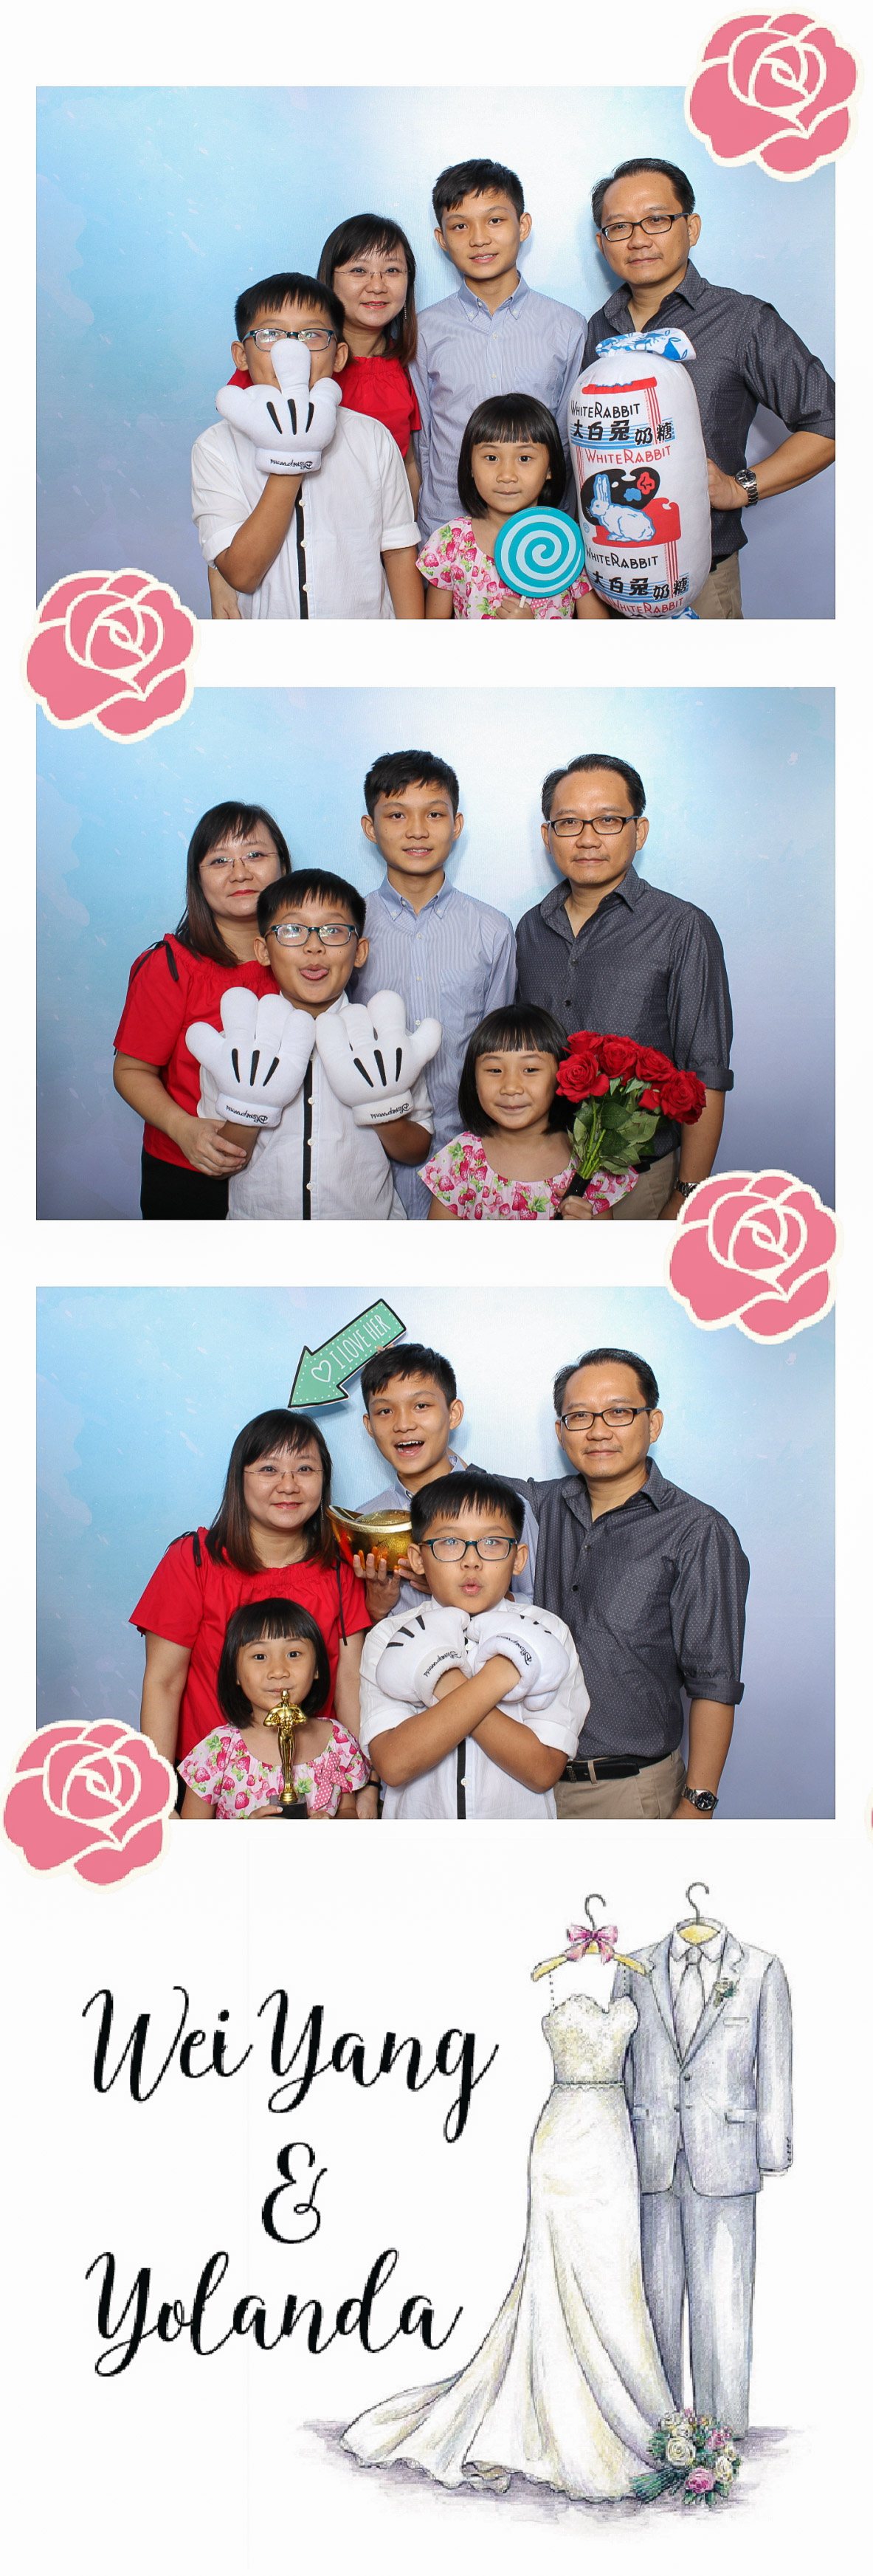 Photobooth 1706-7